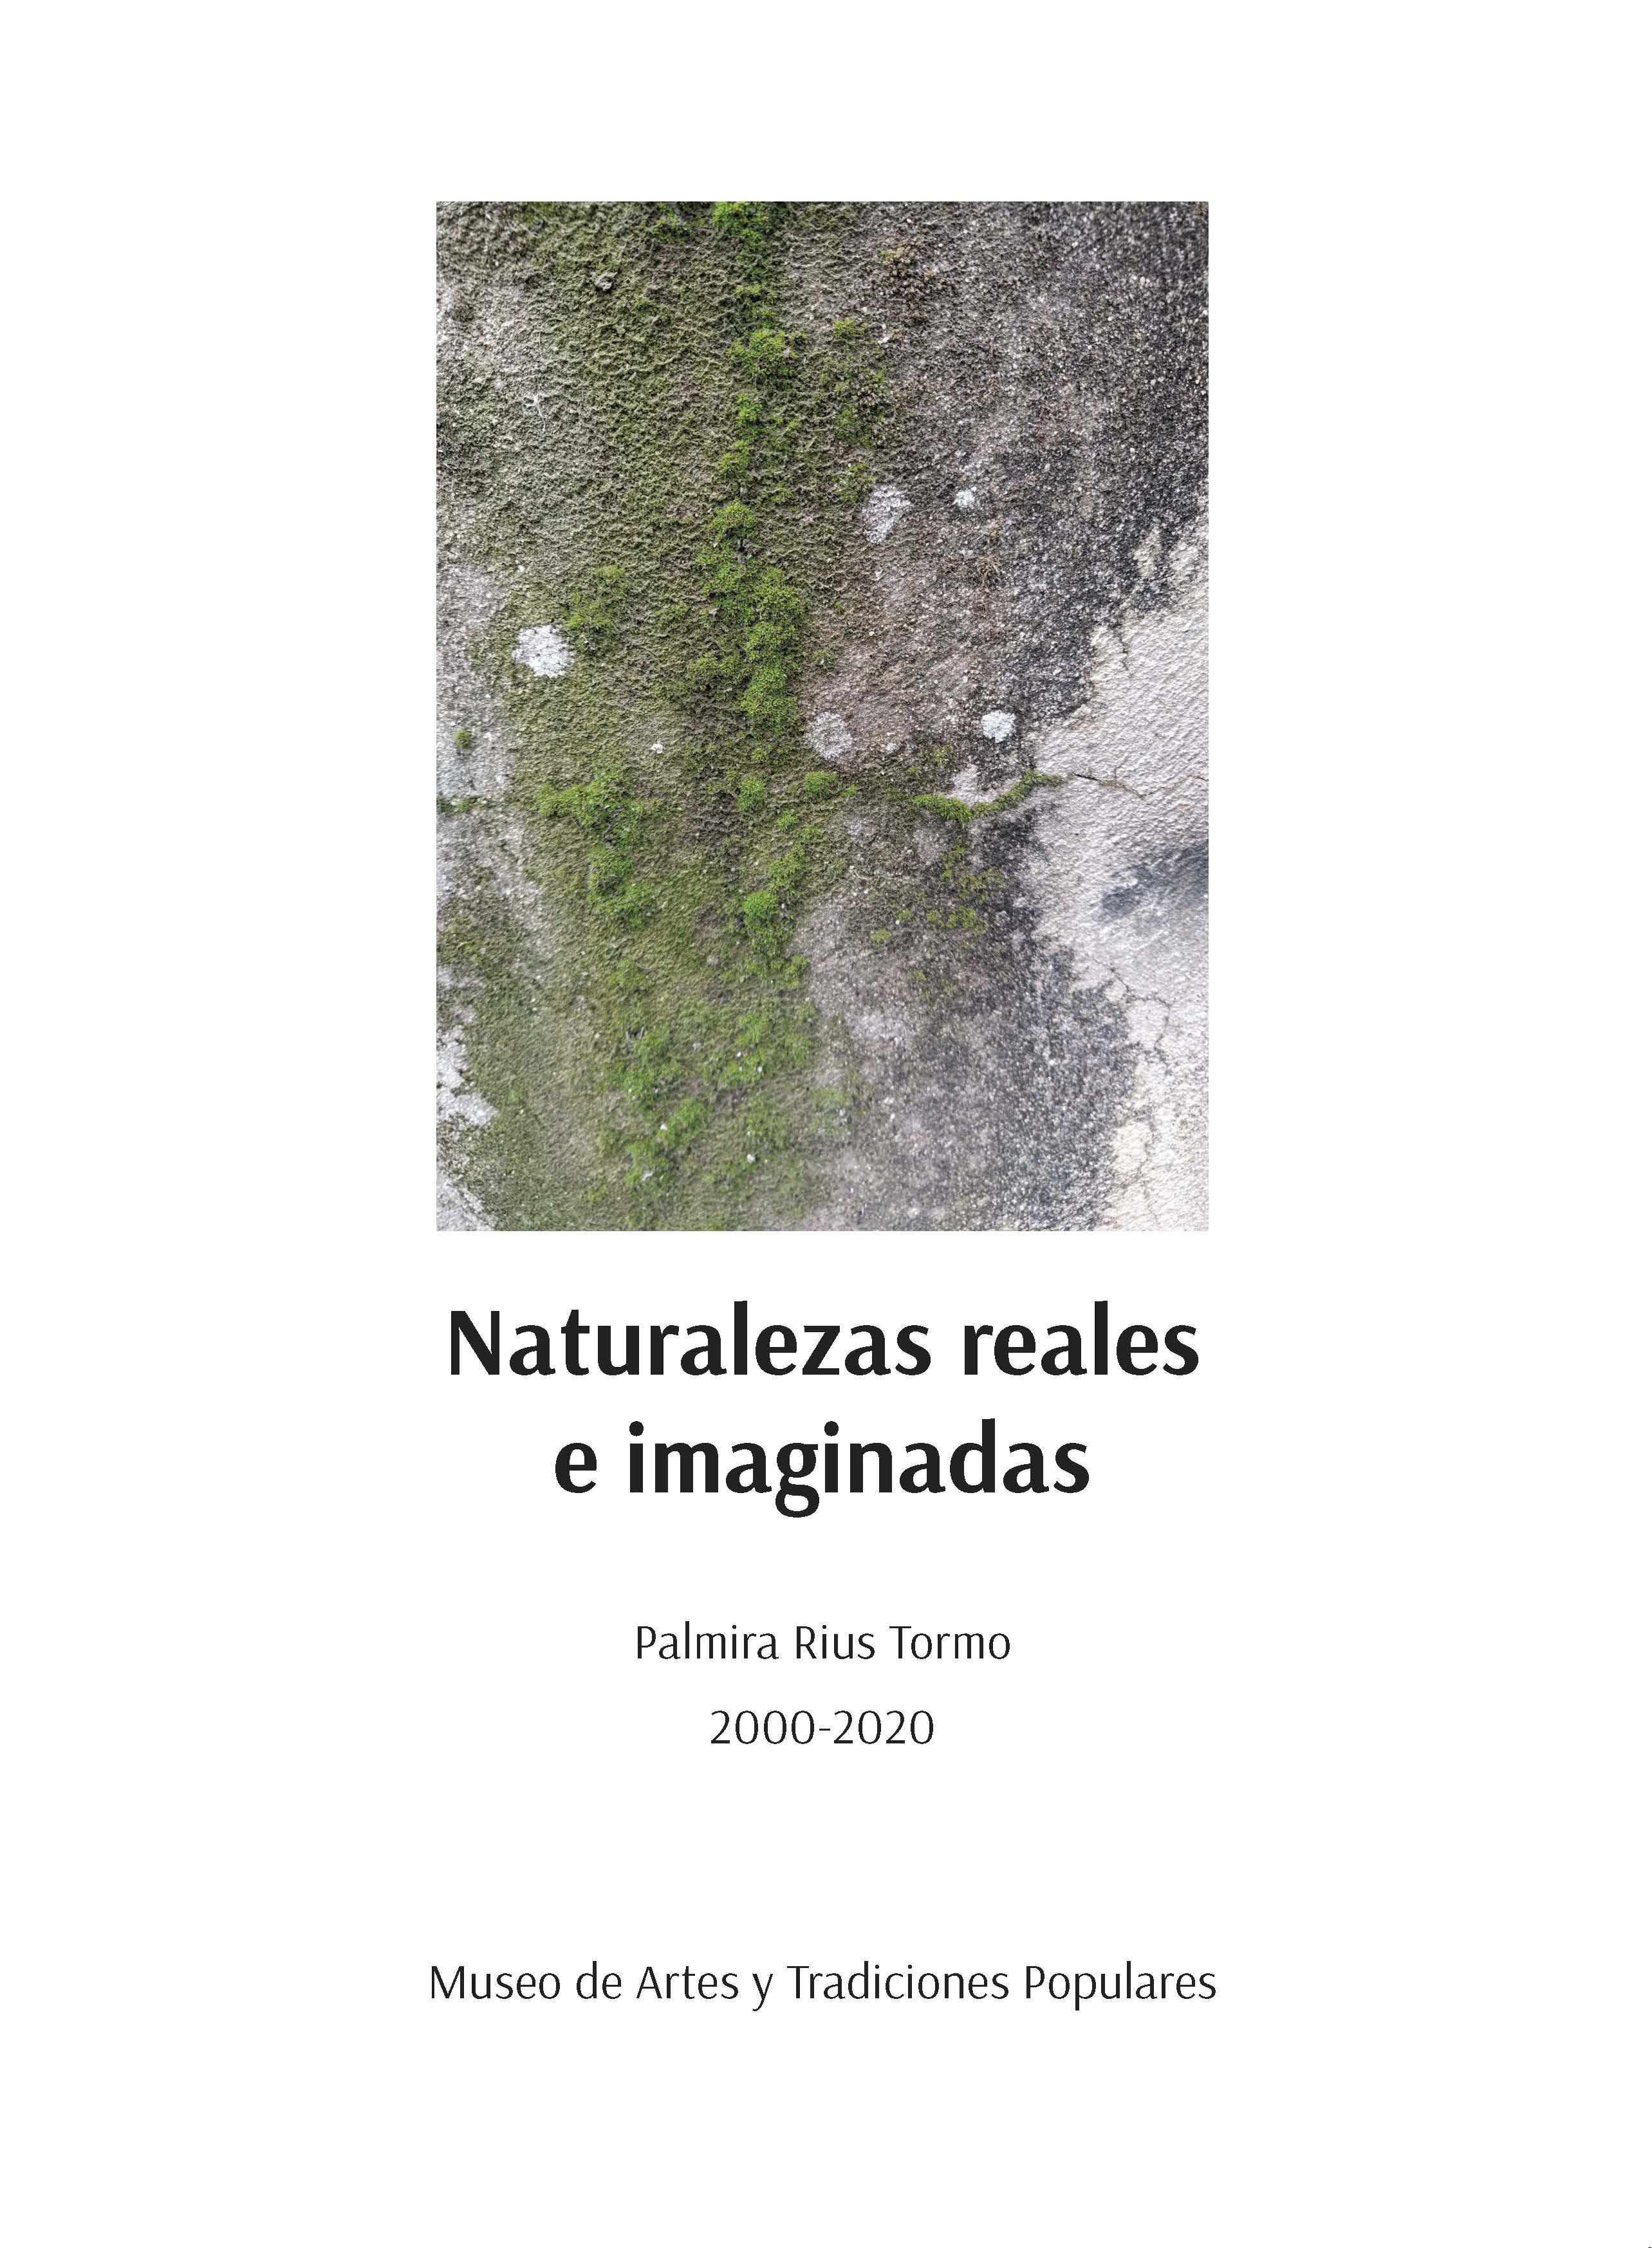 Portada del libro naturalezas reales e imaginadas